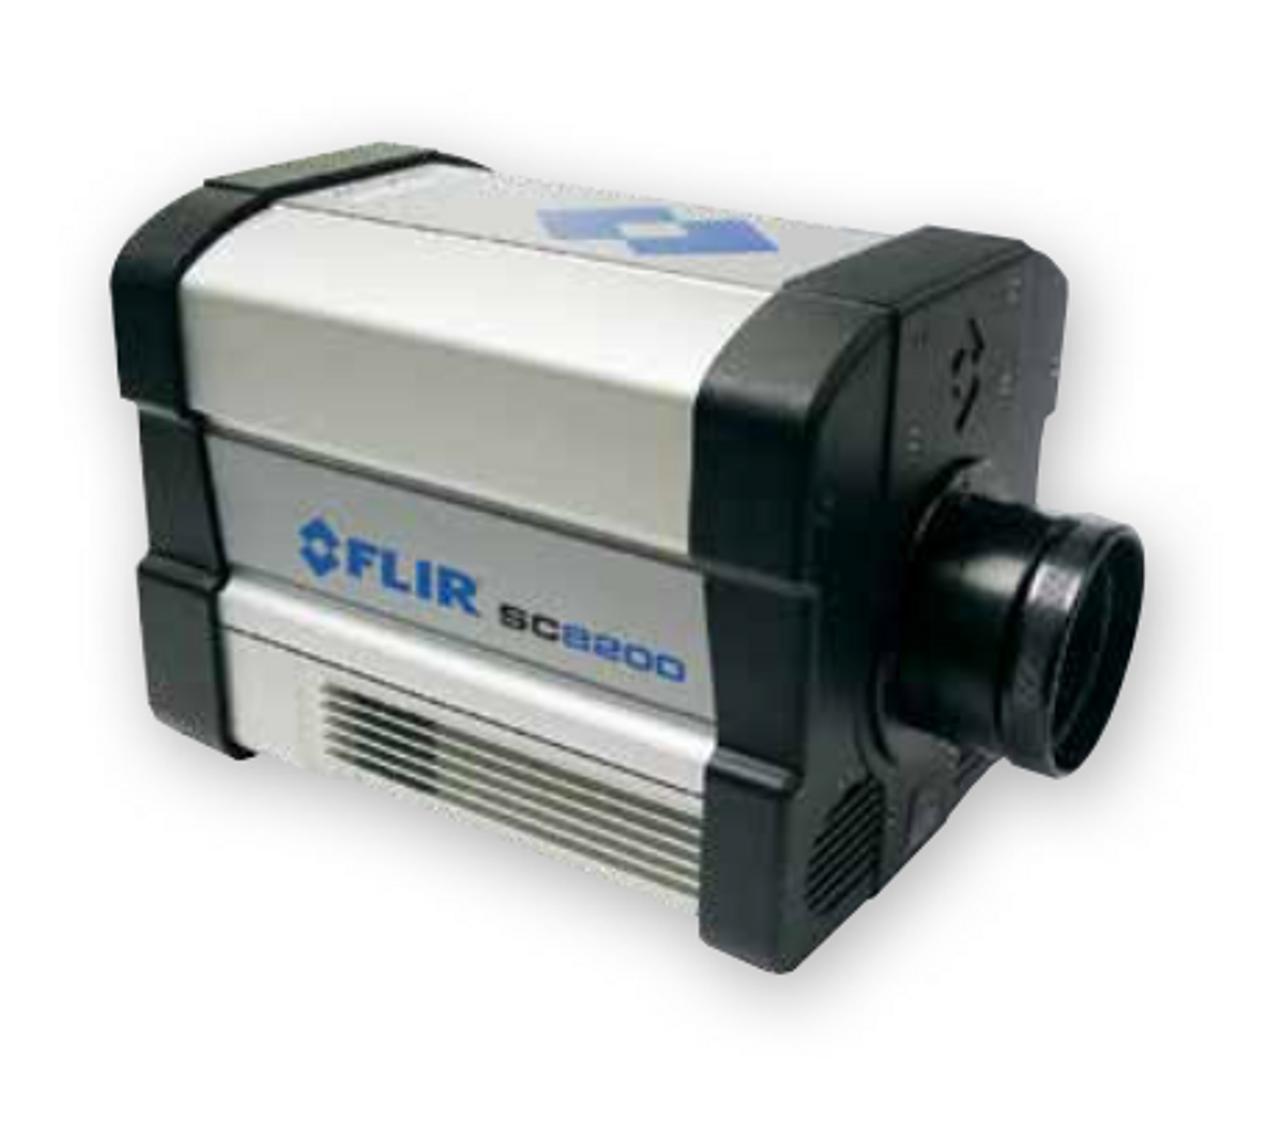 FLIR SC8313 High Speed Infrared Camera